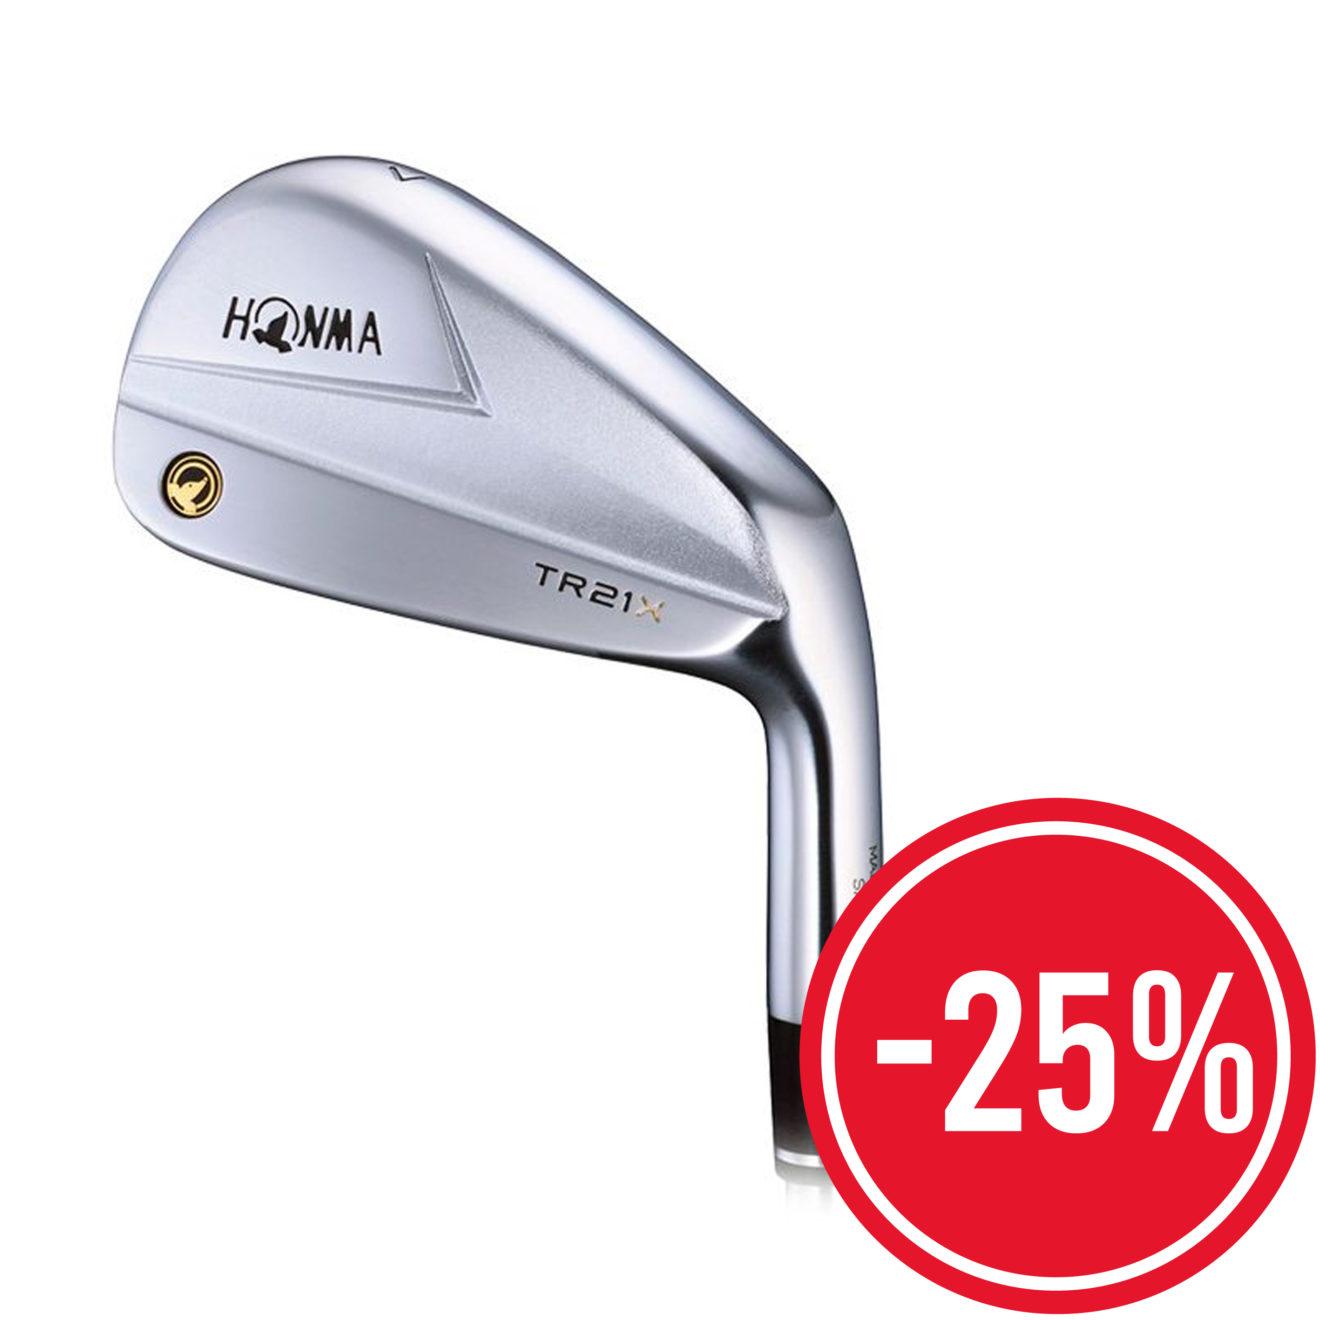 honma-25%